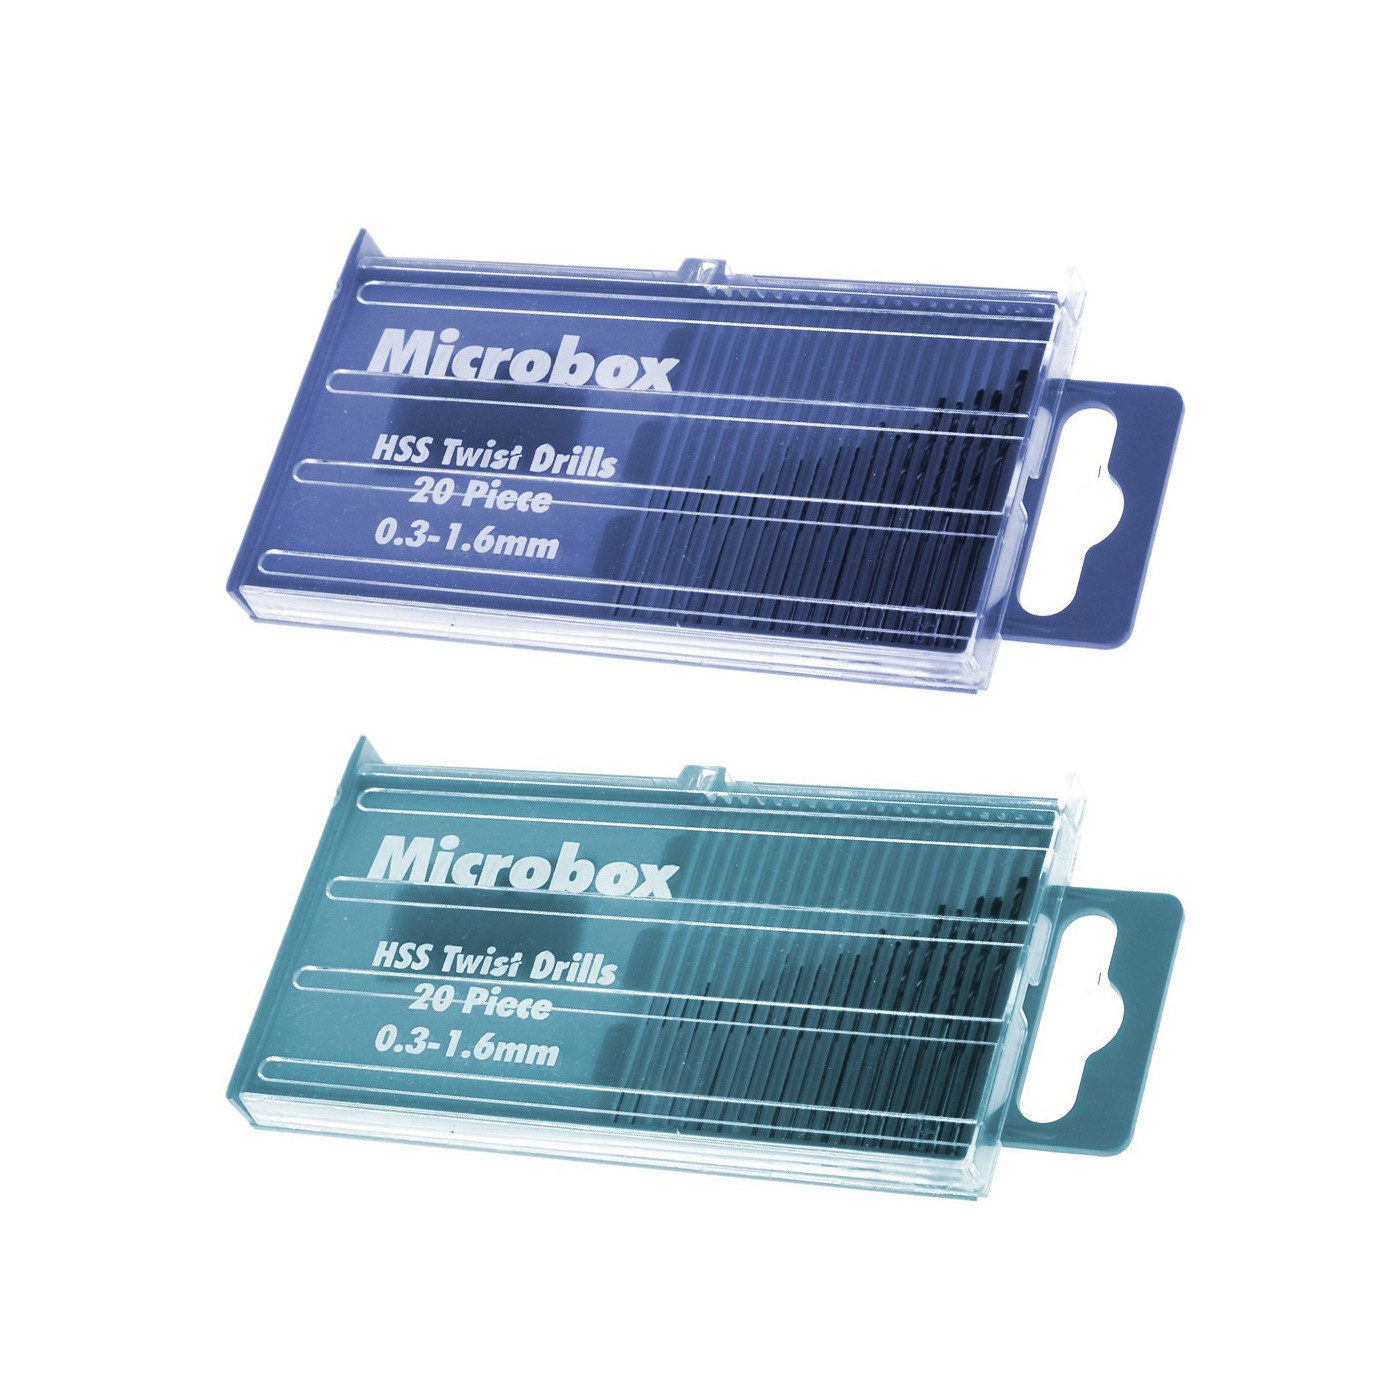 Conjunto de 2 brocas hss micro brocas 0,3-1,6 mm  - 1